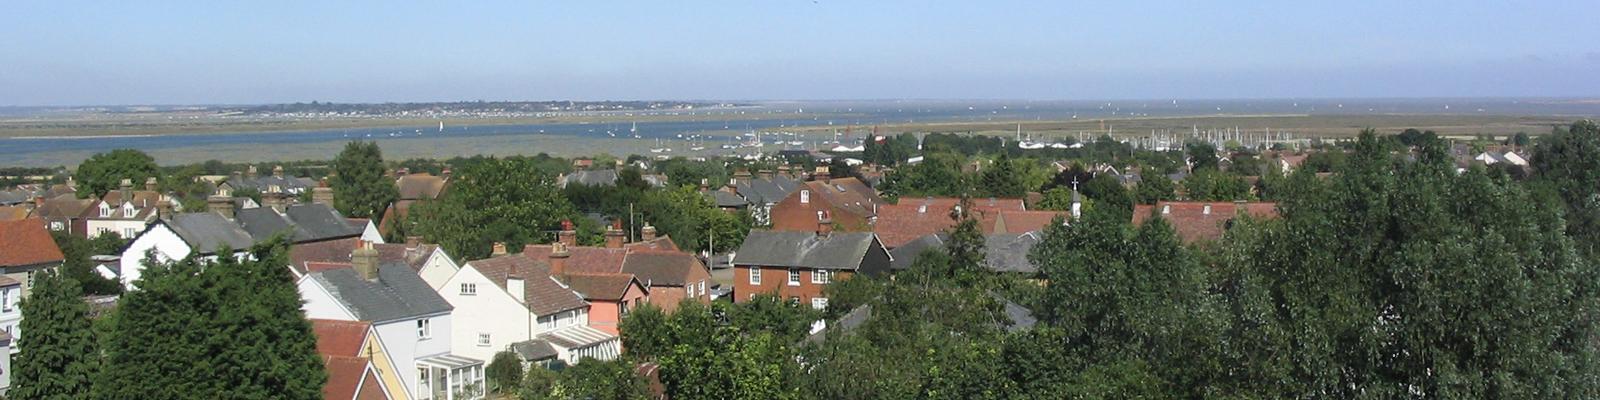 Tollesbury Parish Council, Neighbourhood Plan, View Over Tollesbury